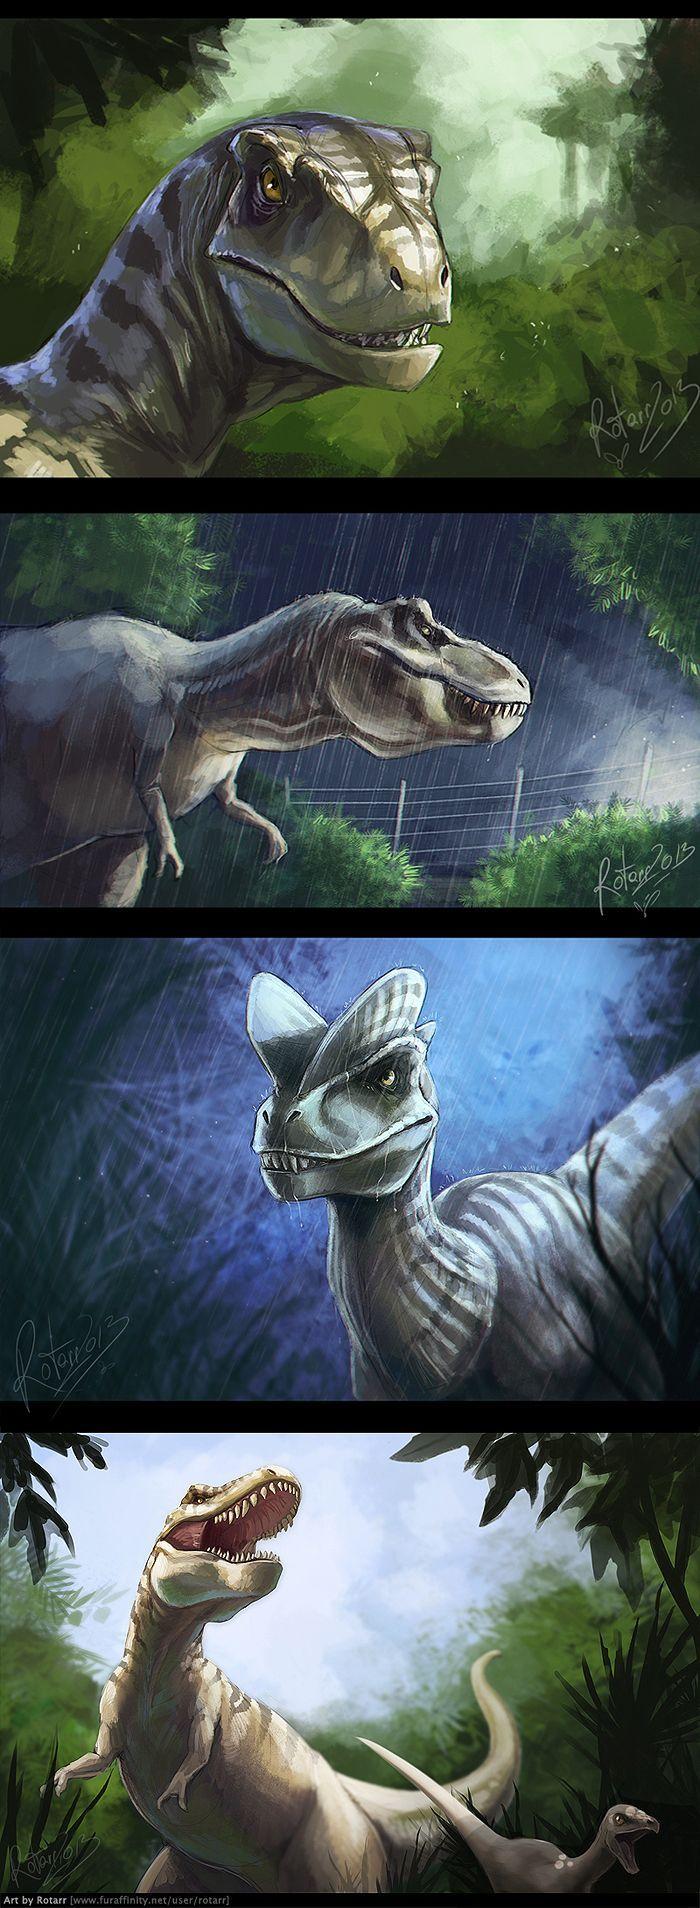 Jurassic Park Dinosaurs by FlyQueen jurassicworld